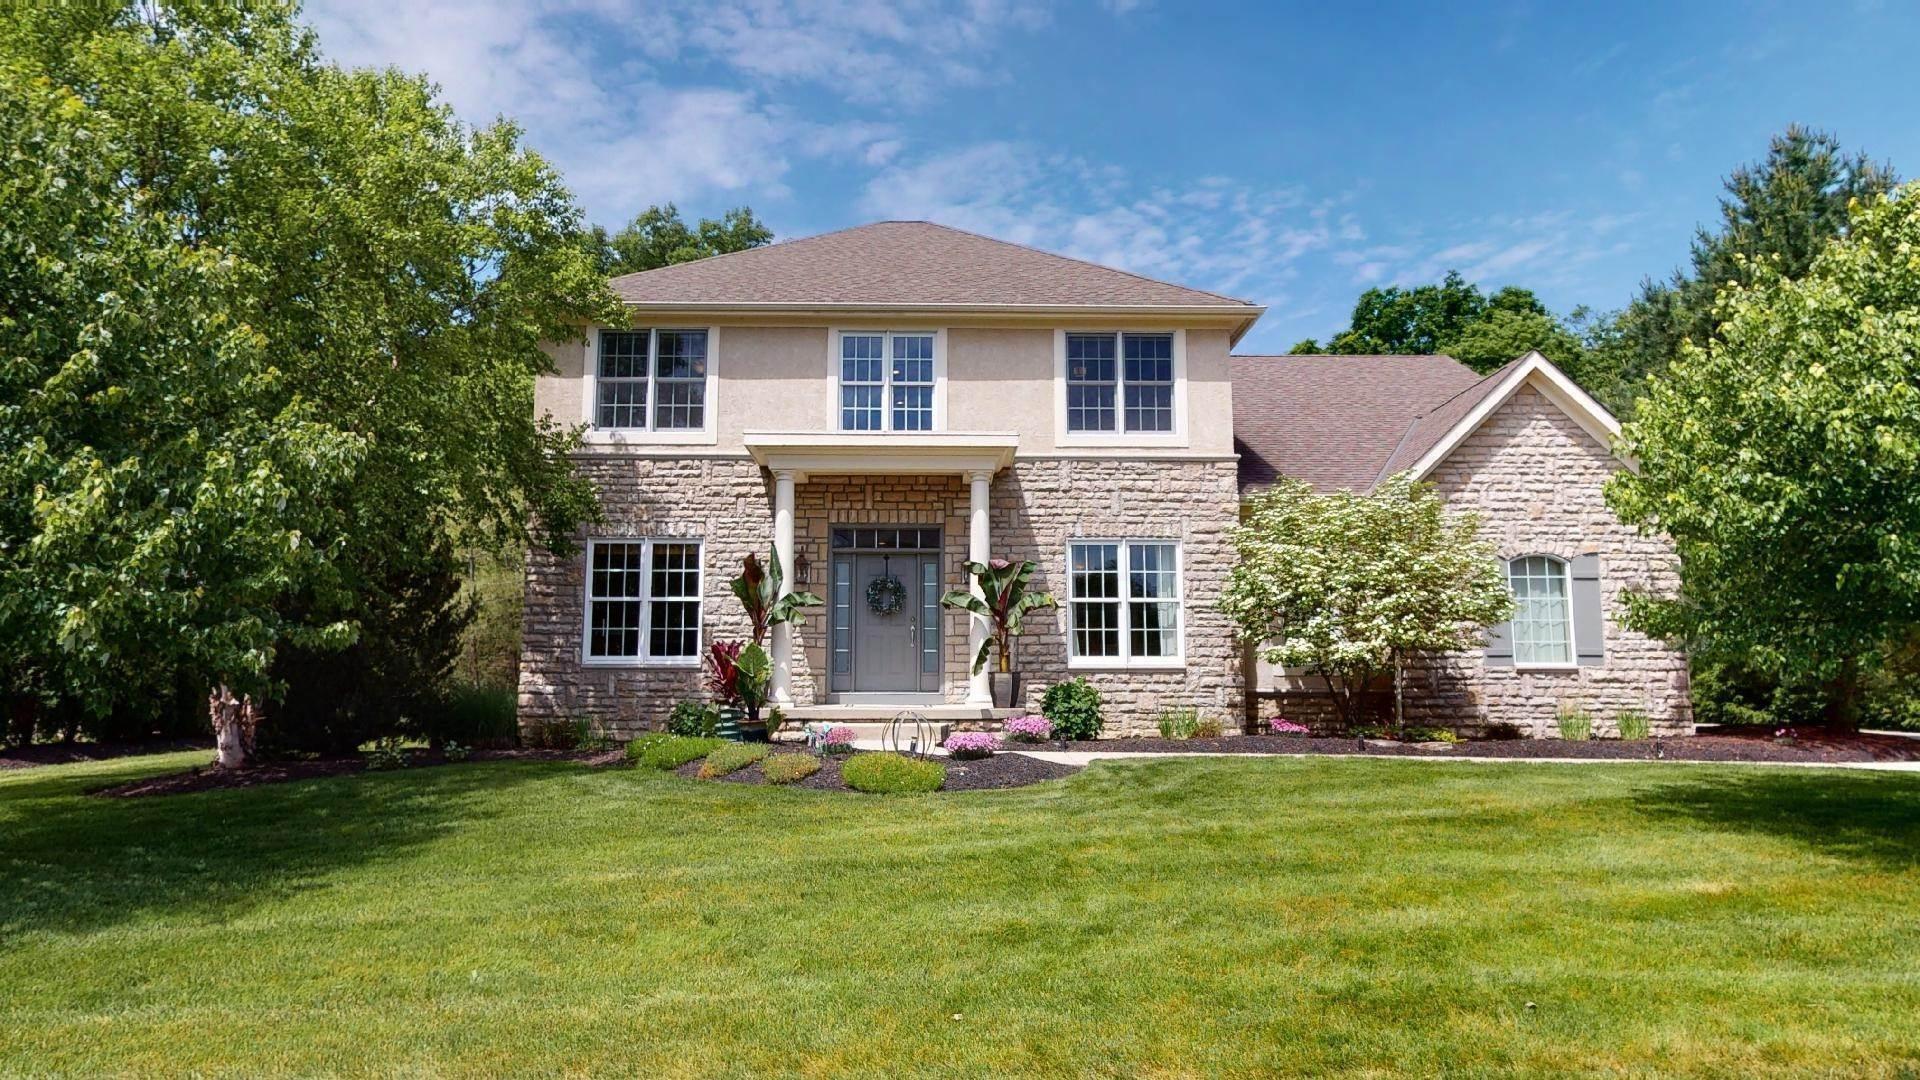 Single Family Homes for Sale at 1125 Jackson Hole Blacklick, Ohio 43004 United States